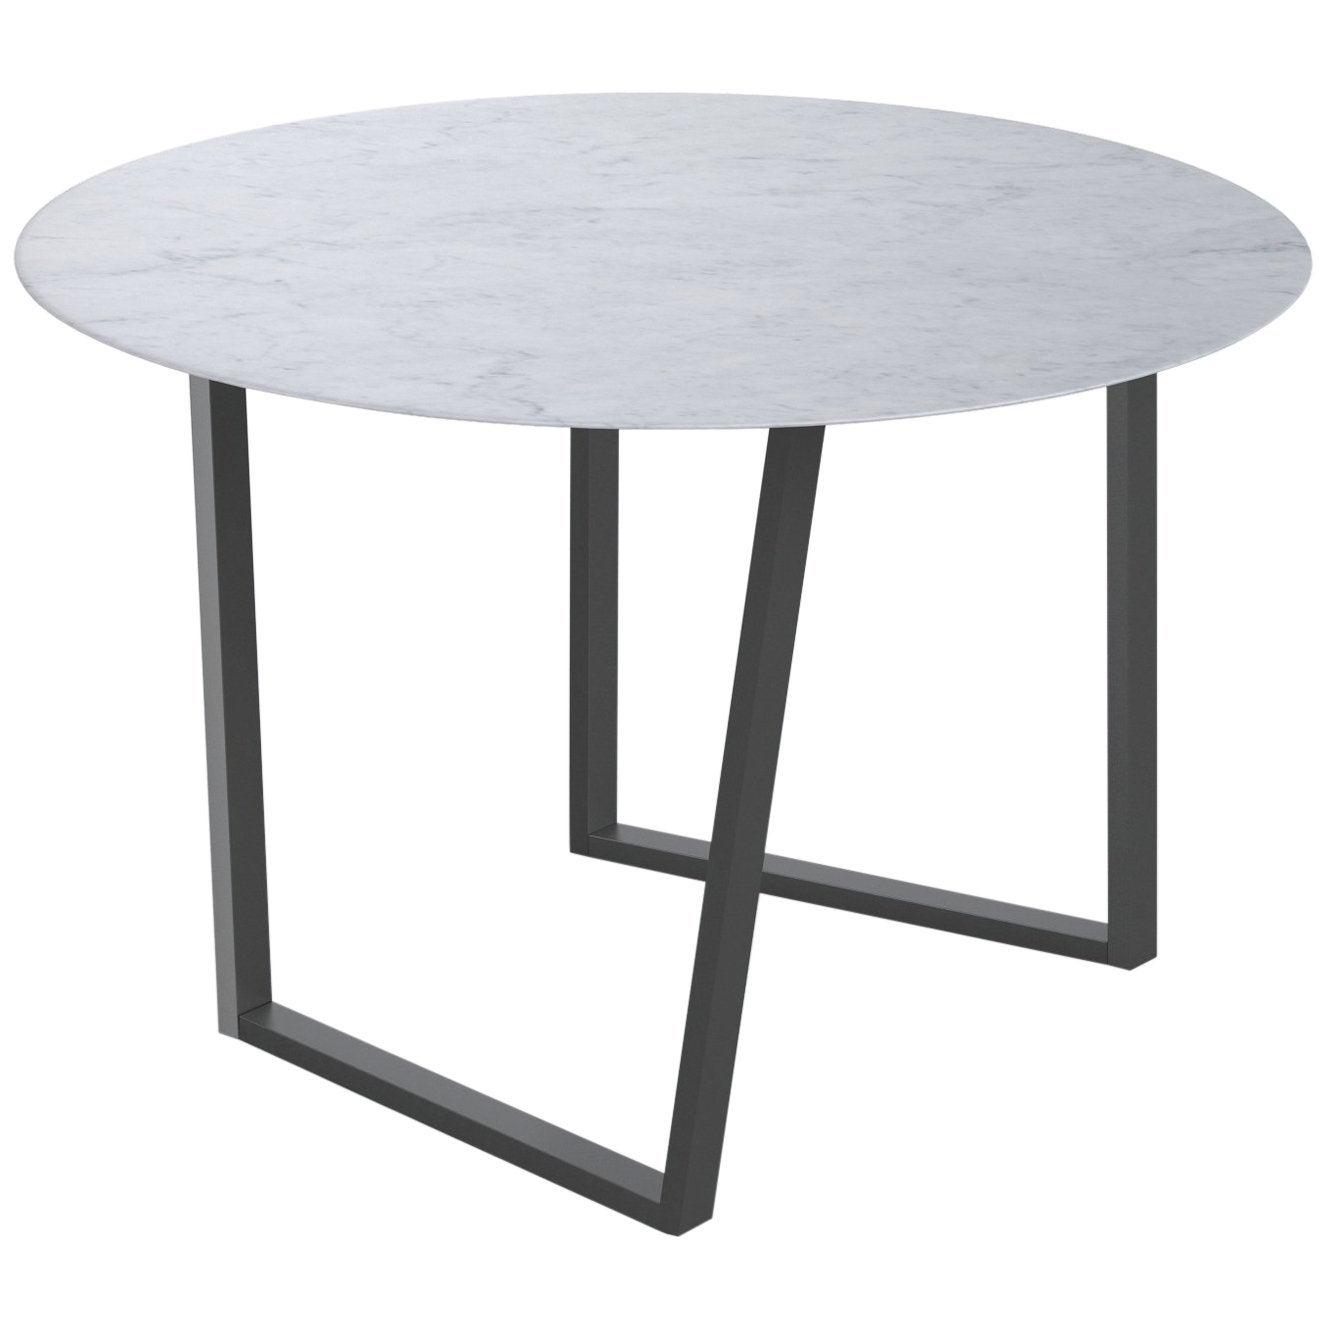 Salvatori Round Dritto Dining Table by Piero Lissoni